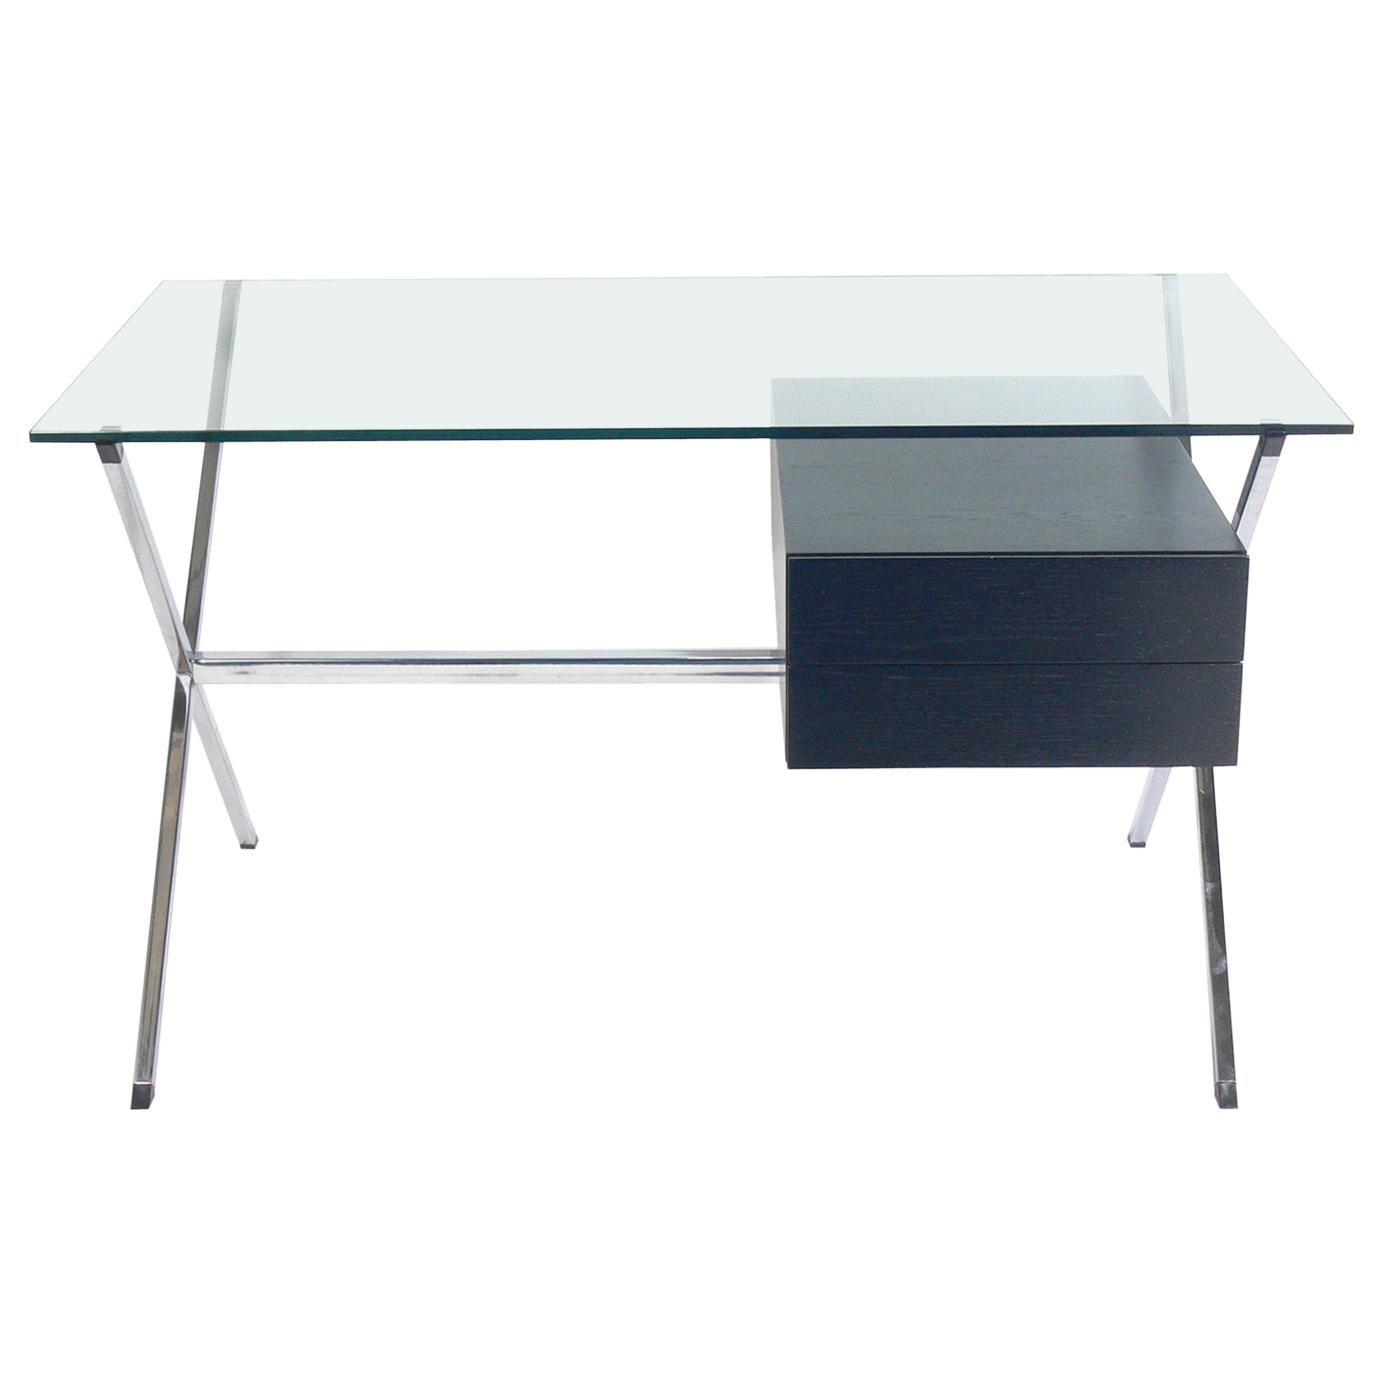 Sculptural X-Base Desk by Franco Albini